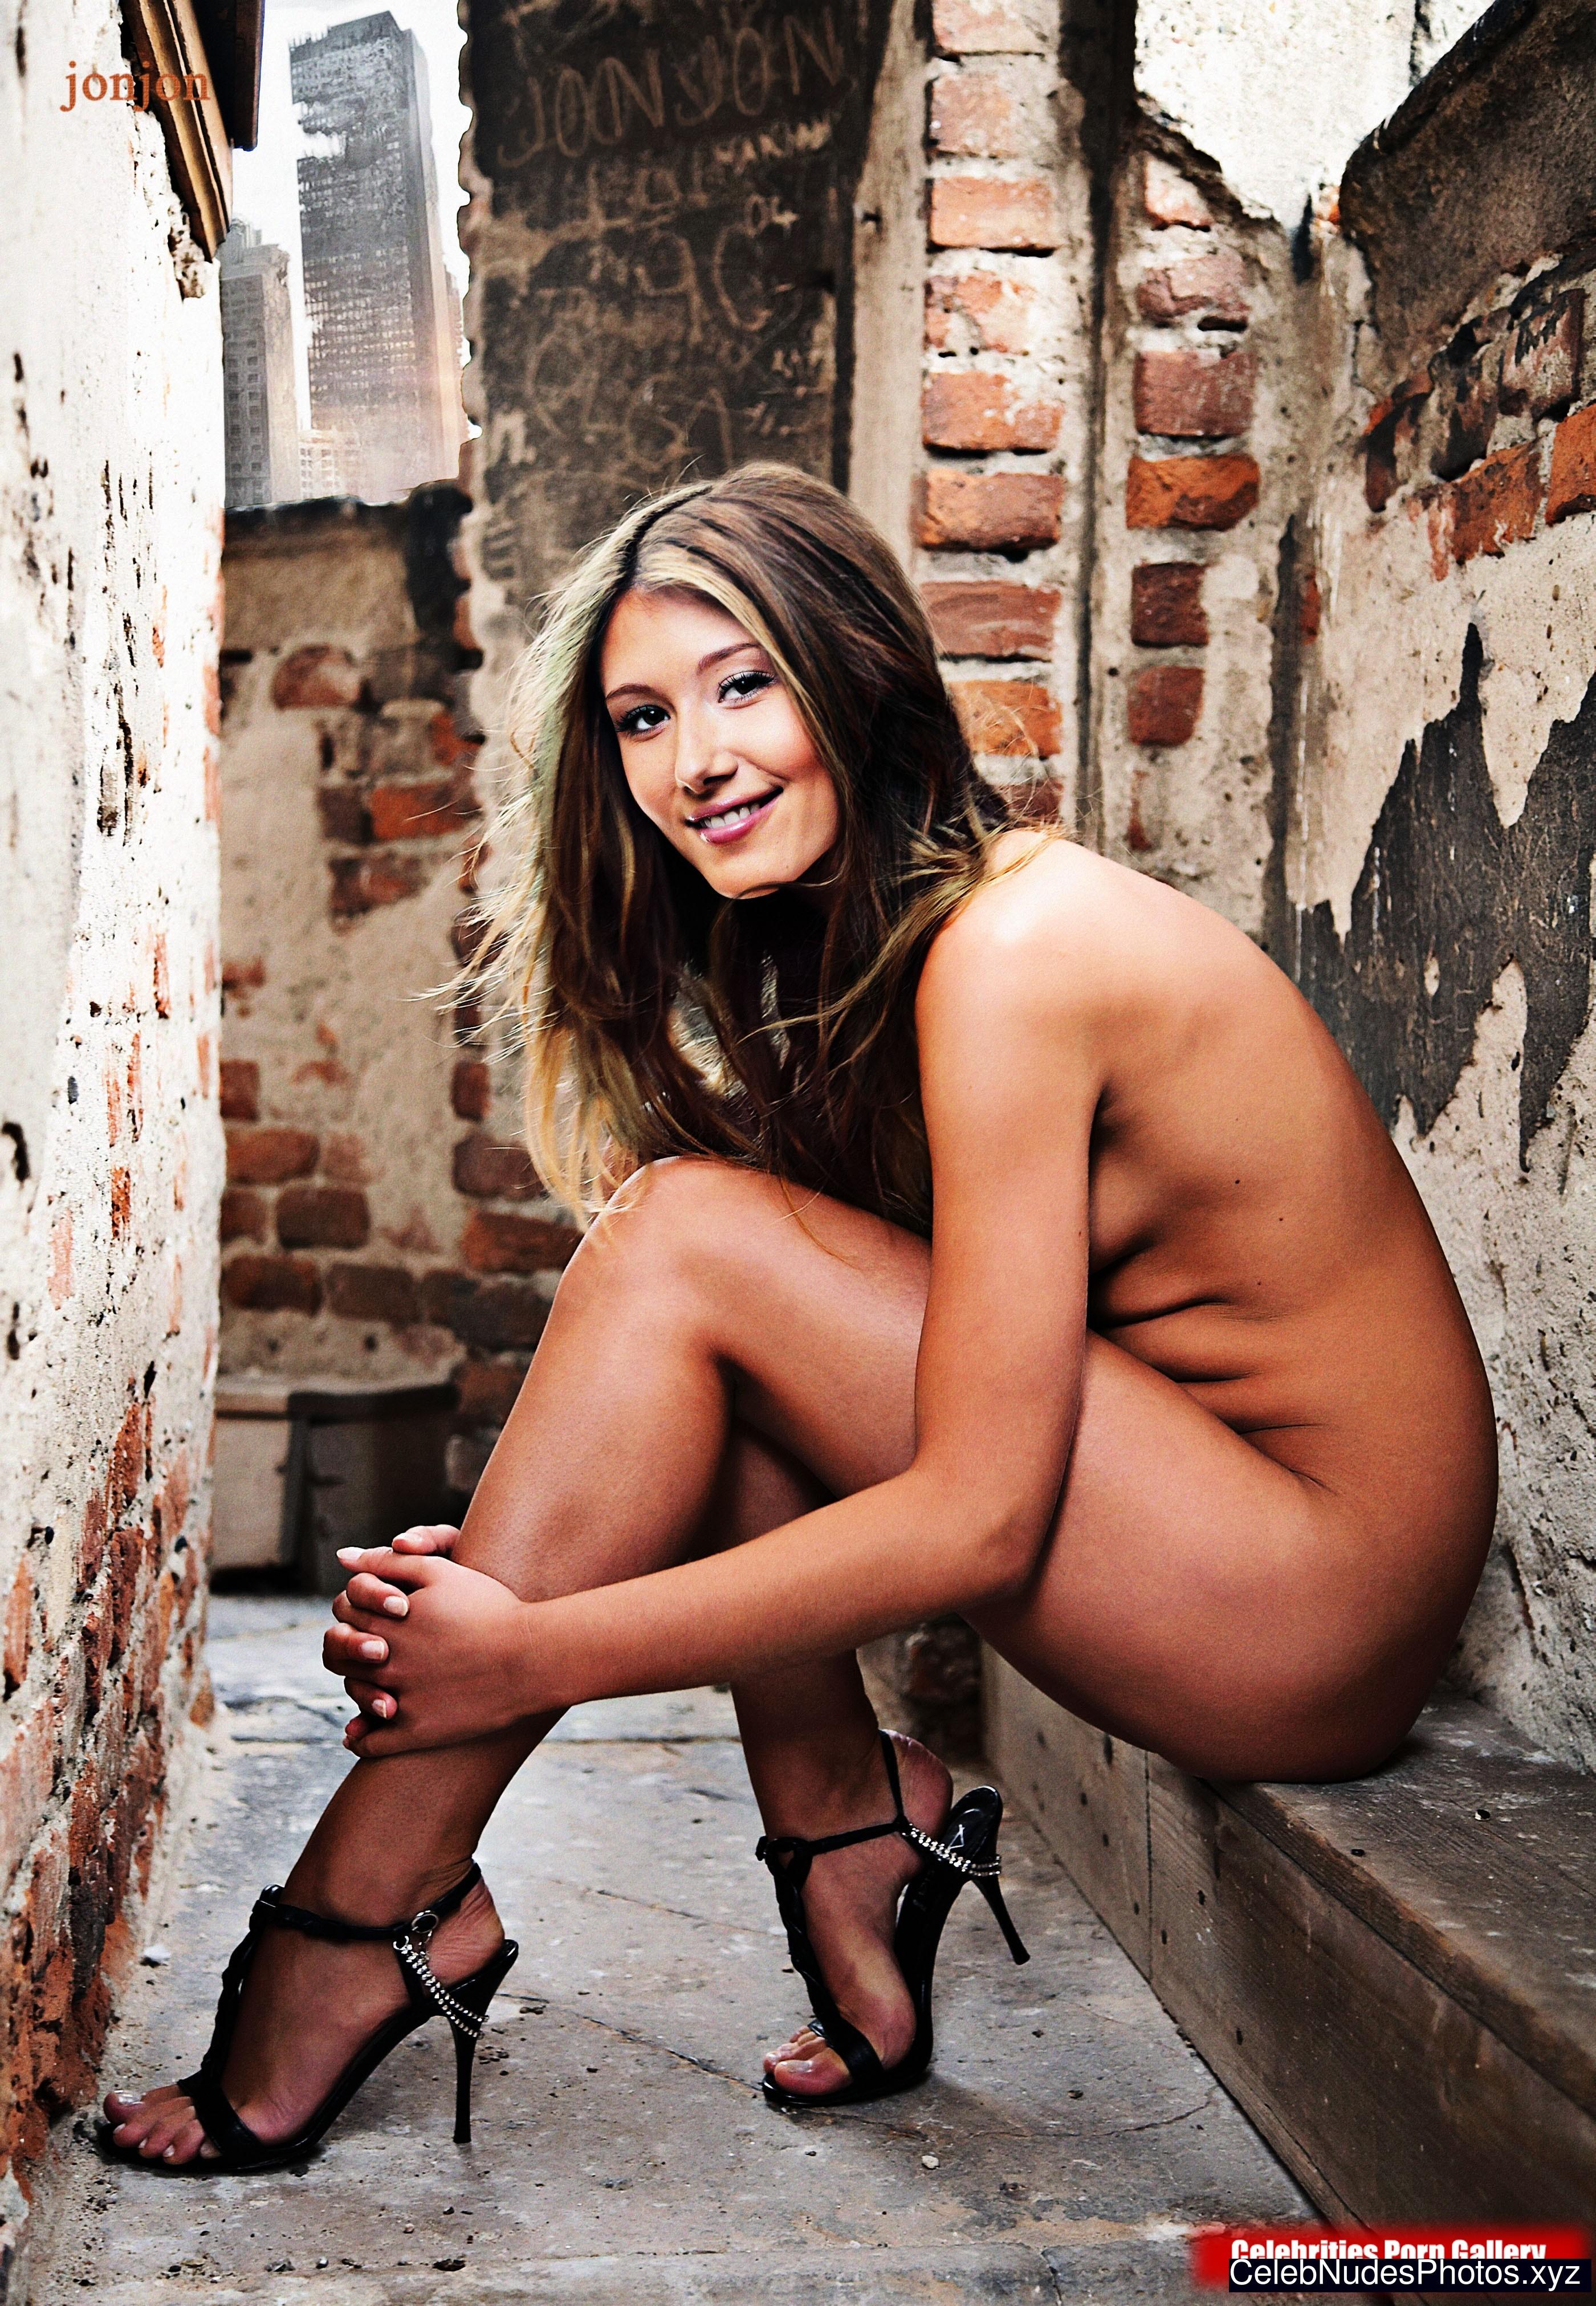 jewel staite sexy nude